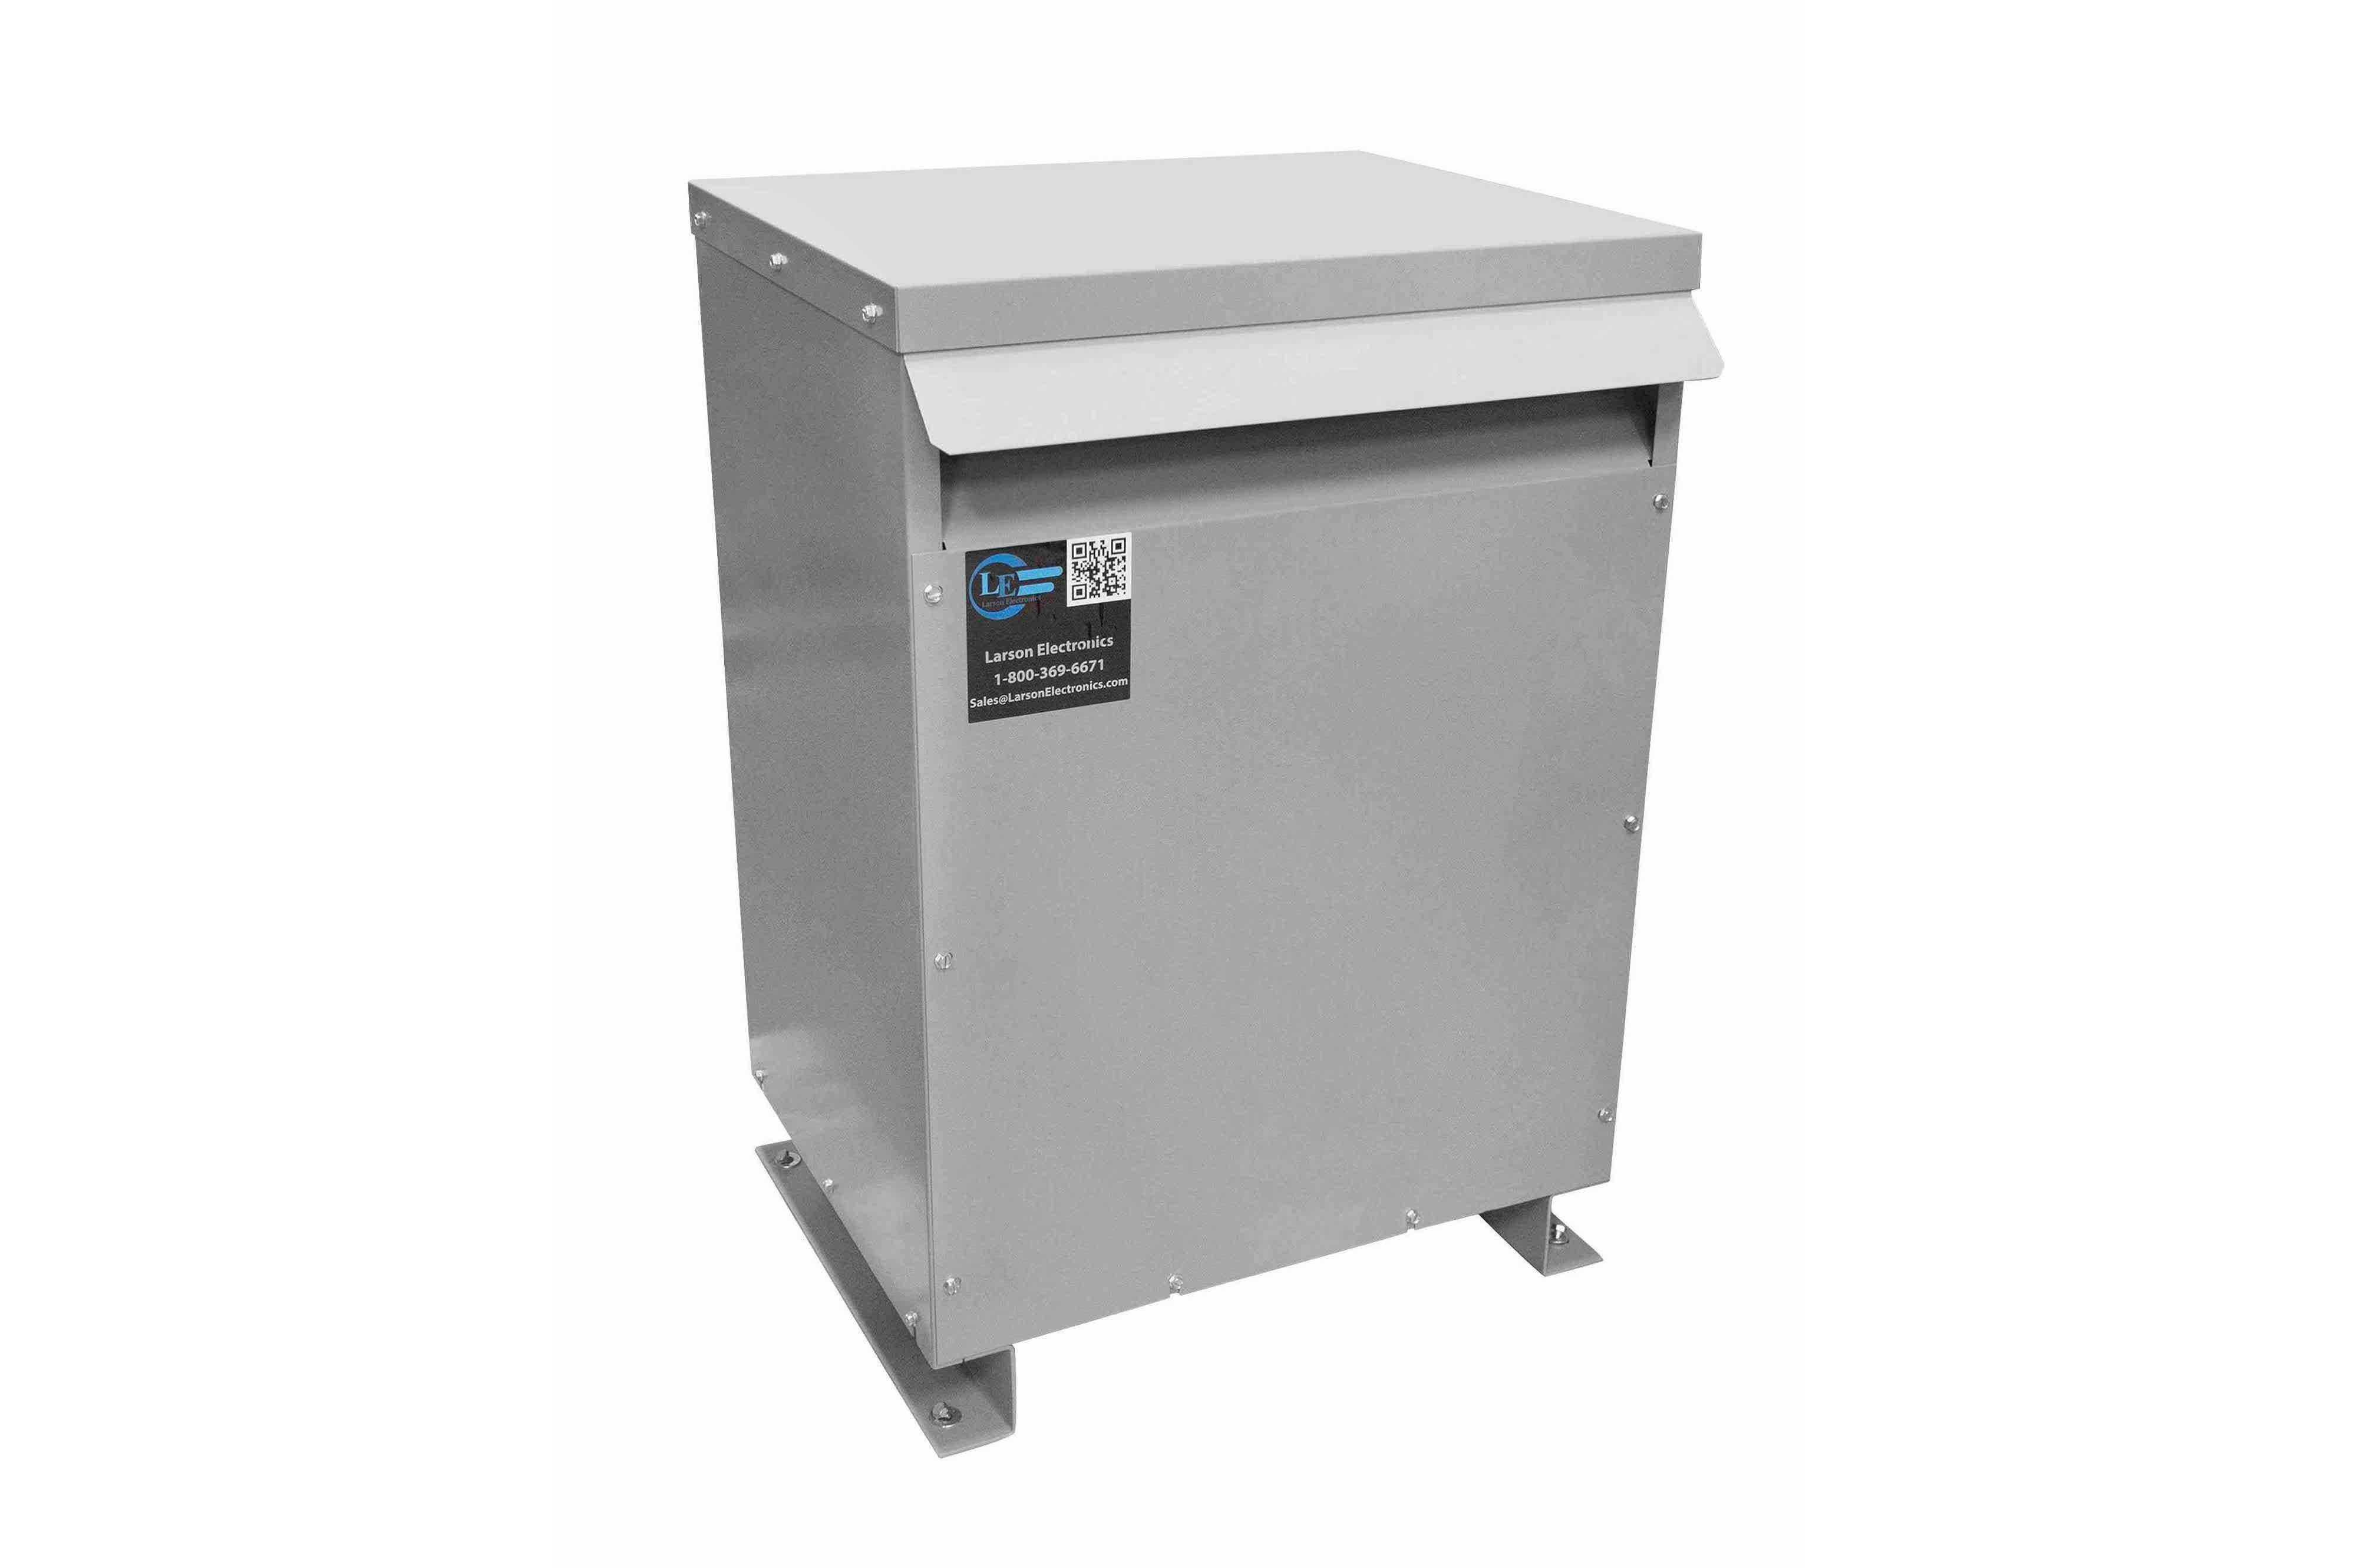 30 kVA 3PH Isolation Transformer, 208V Wye Primary, 480Y/277 Wye-N Secondary, N3R, Ventilated, 60 Hz